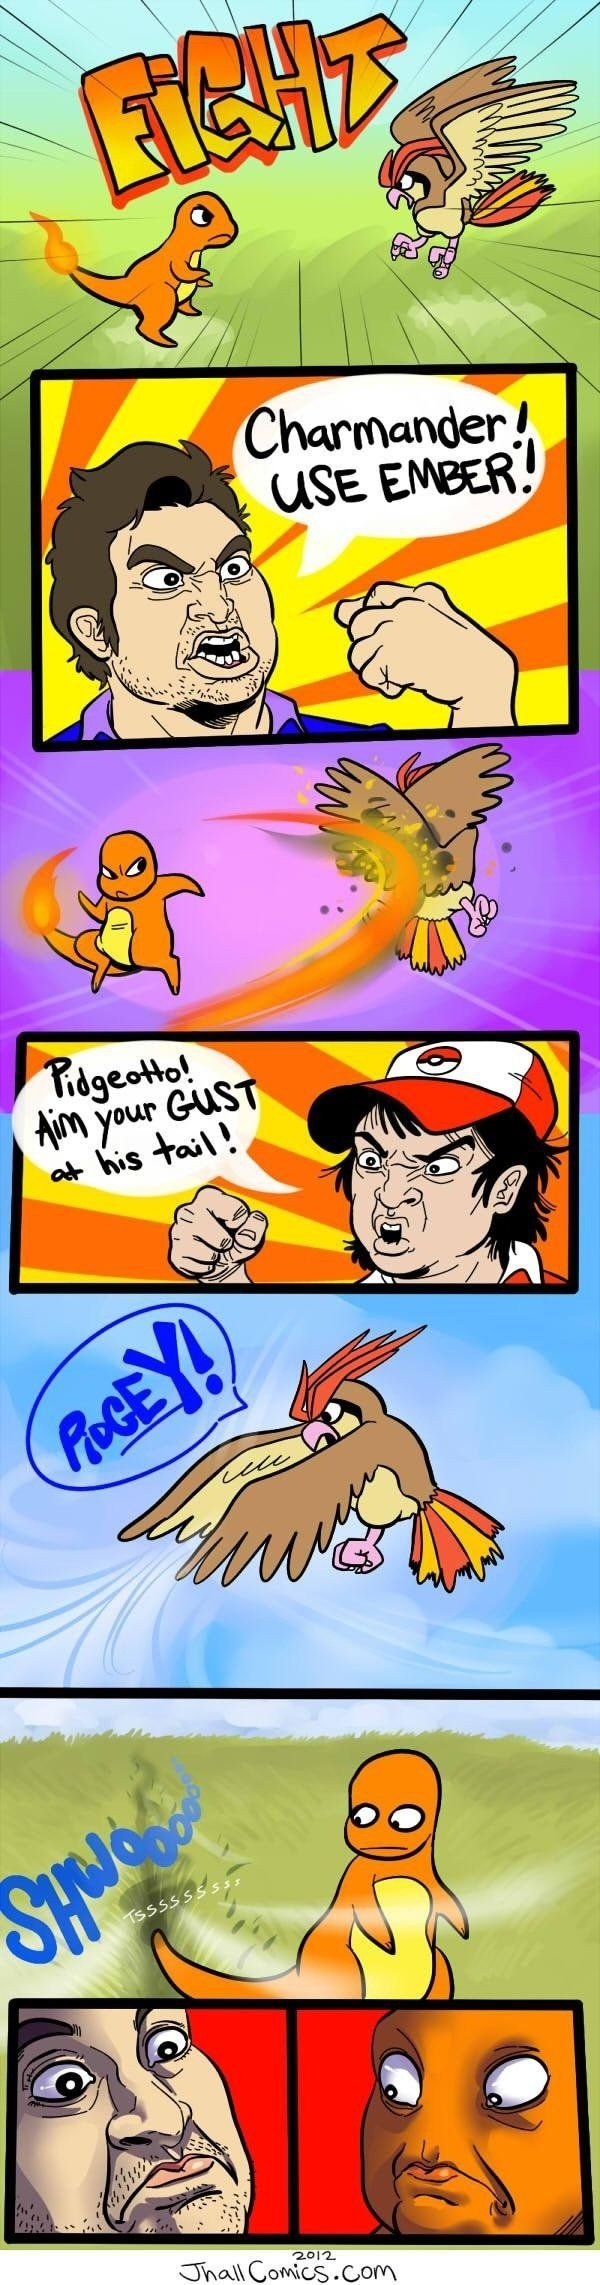 Epic Pokemon Fight